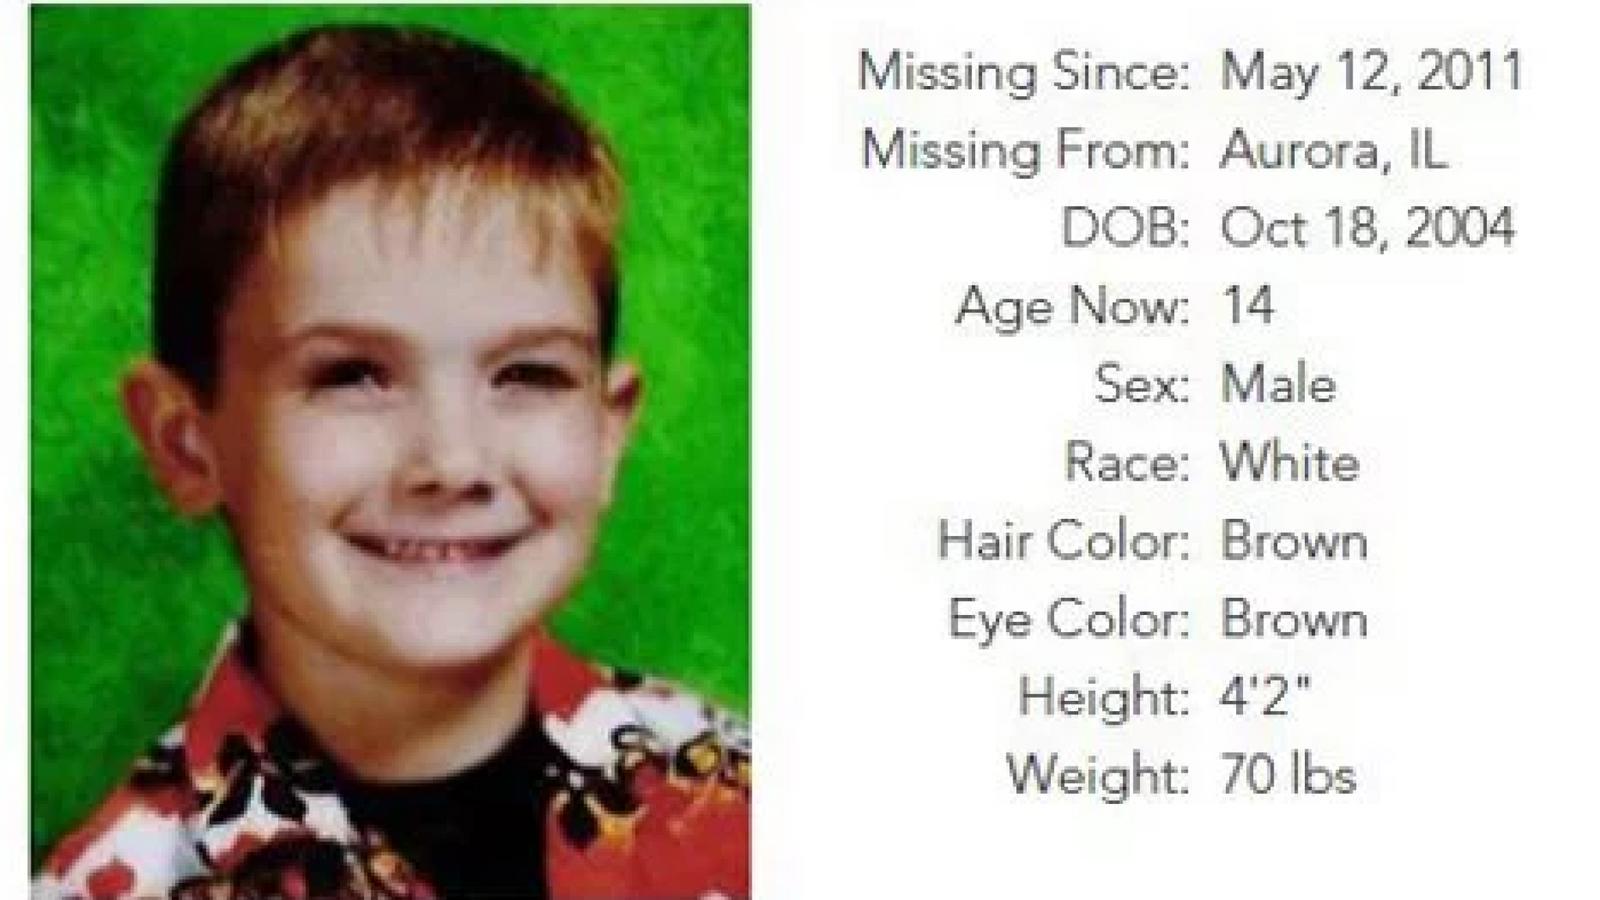 Timmothy Pitzen vanished in 2011. Credit: Missing Timmothy Pitzen